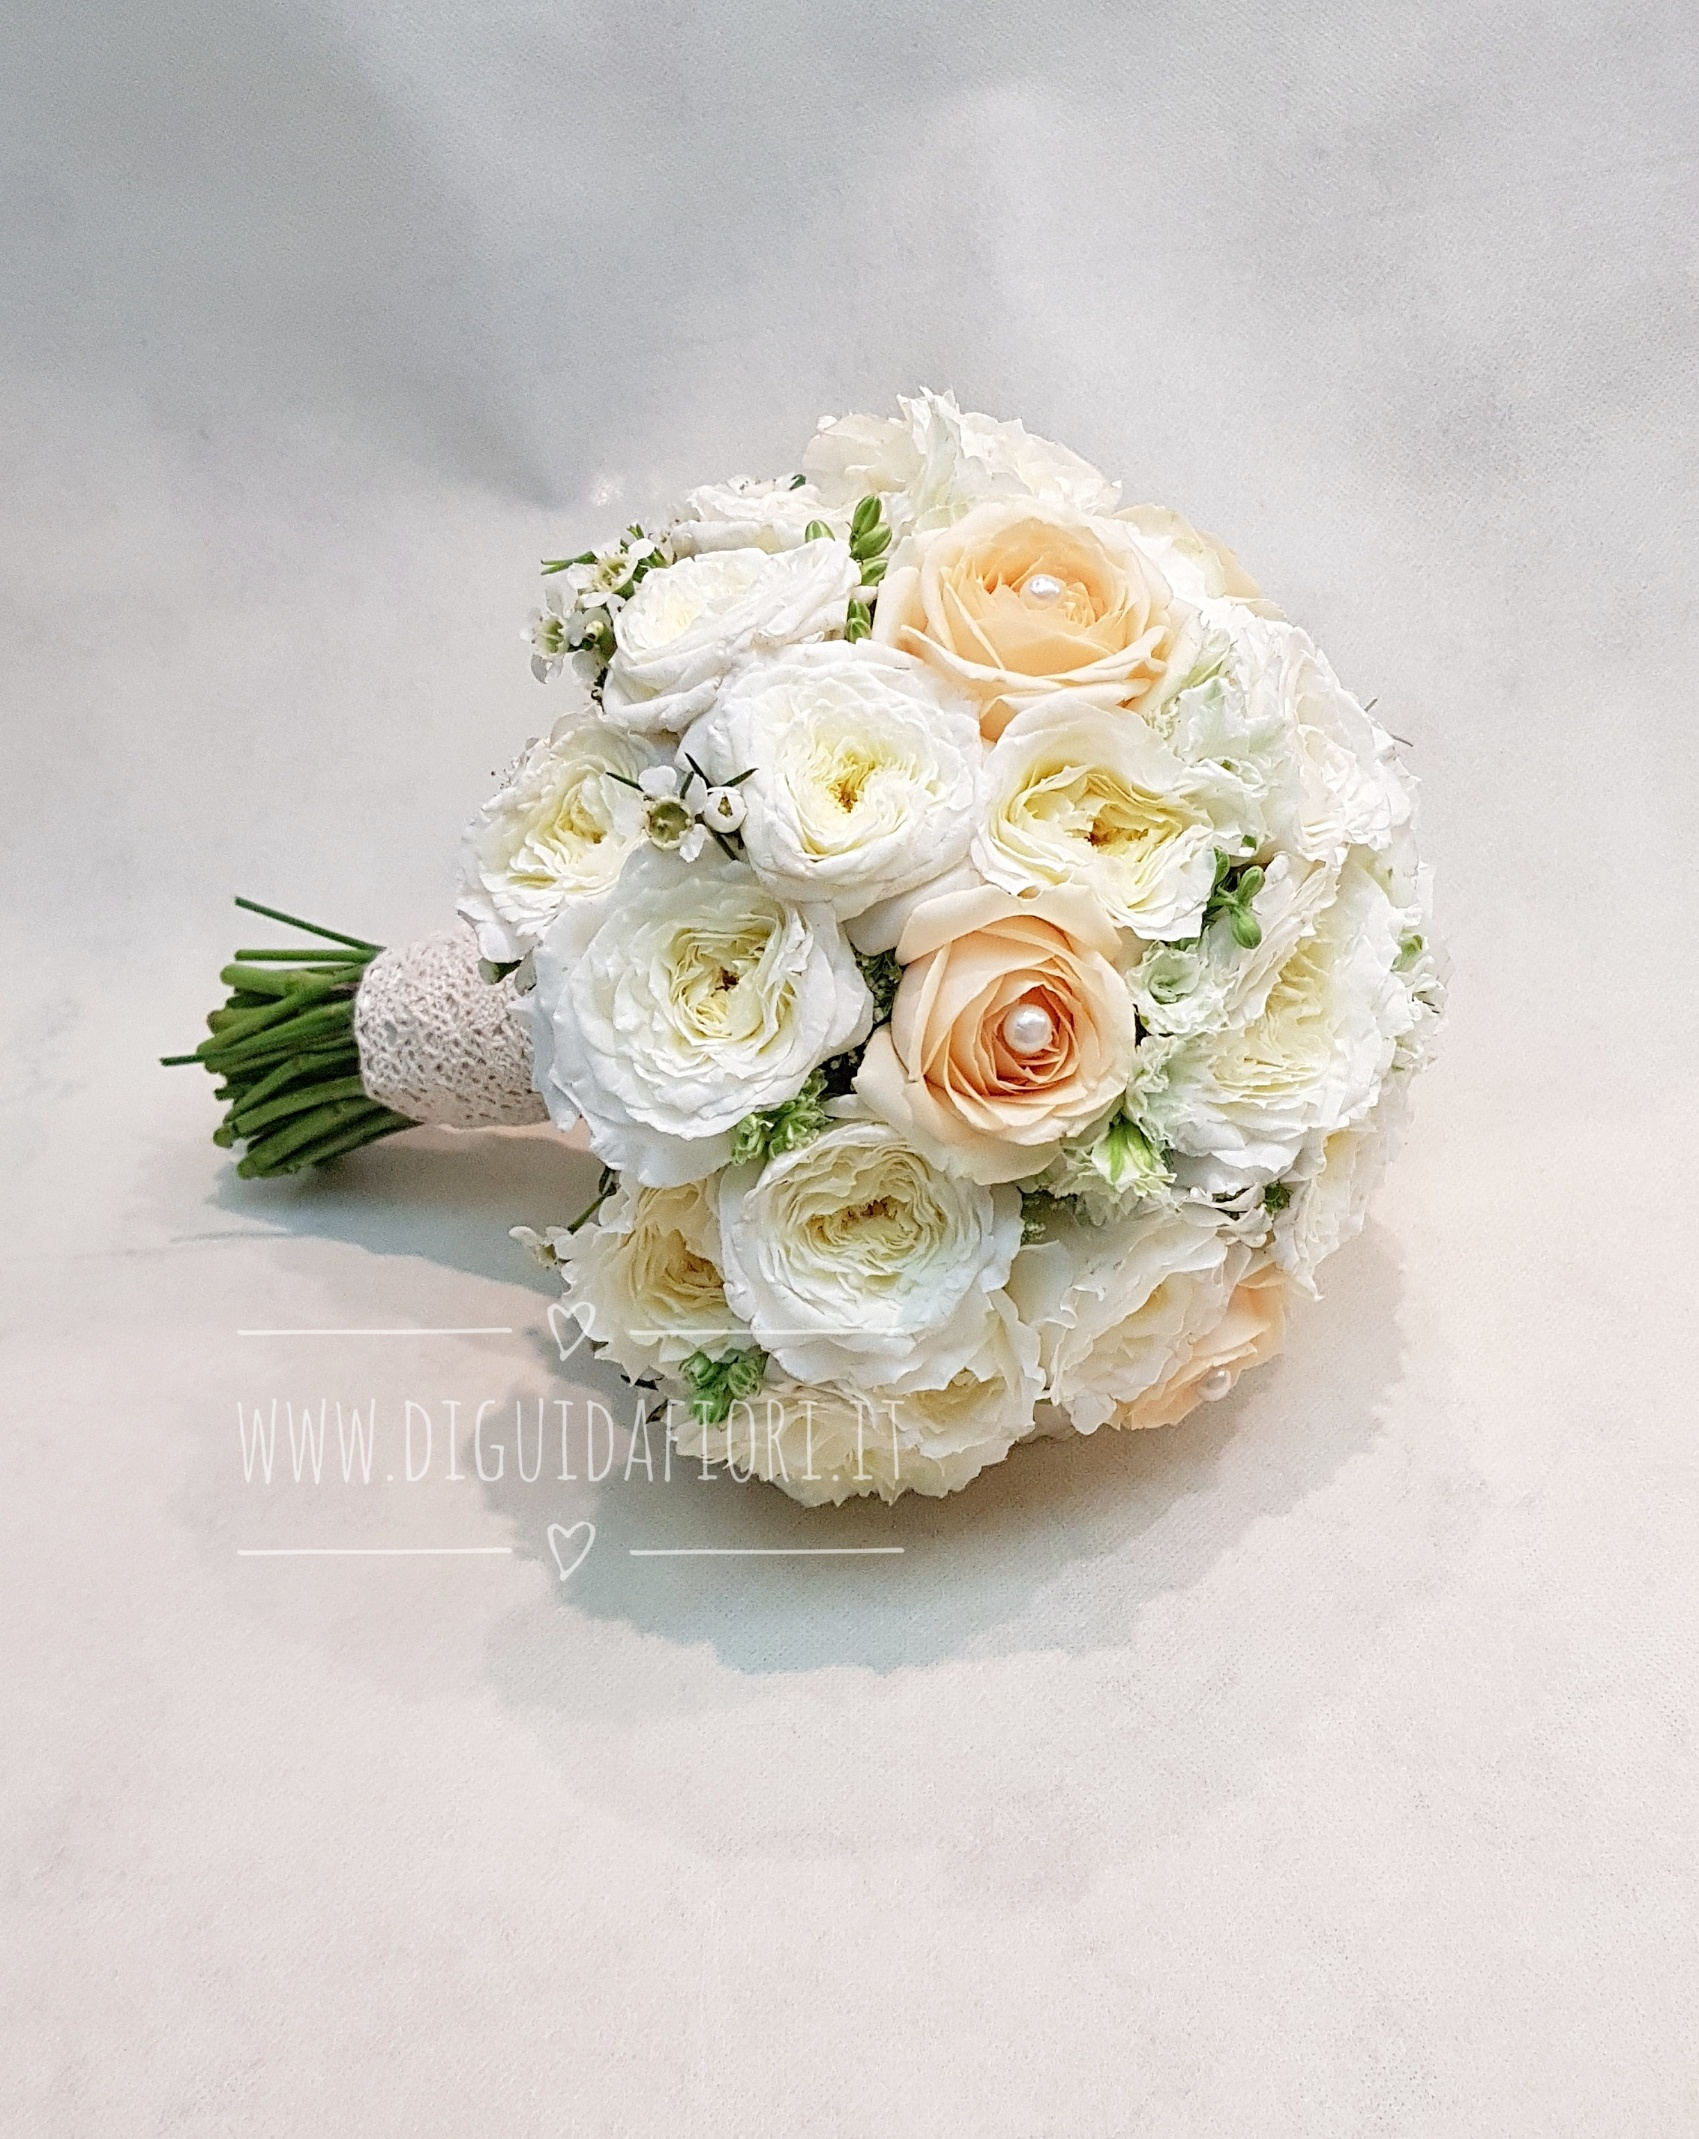 Bouquet da sposa bianco e pesca – Forma semisferica